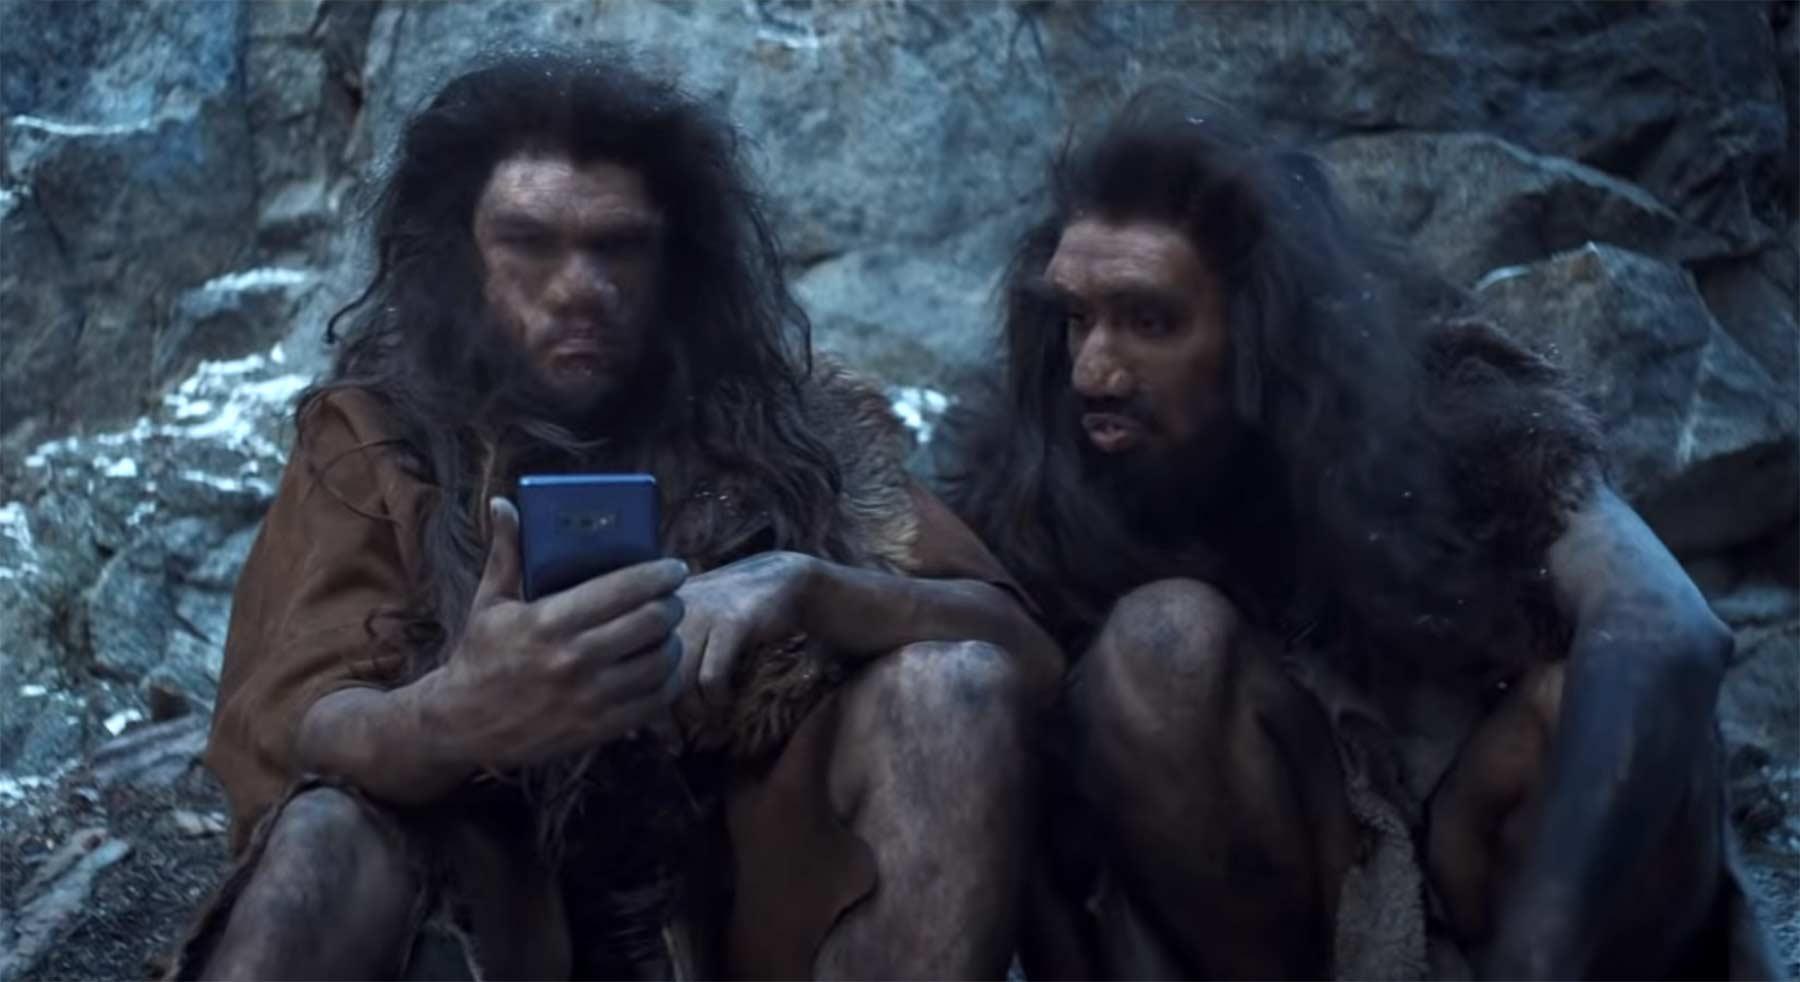 Hätte es früher schon Smartphones gegeben